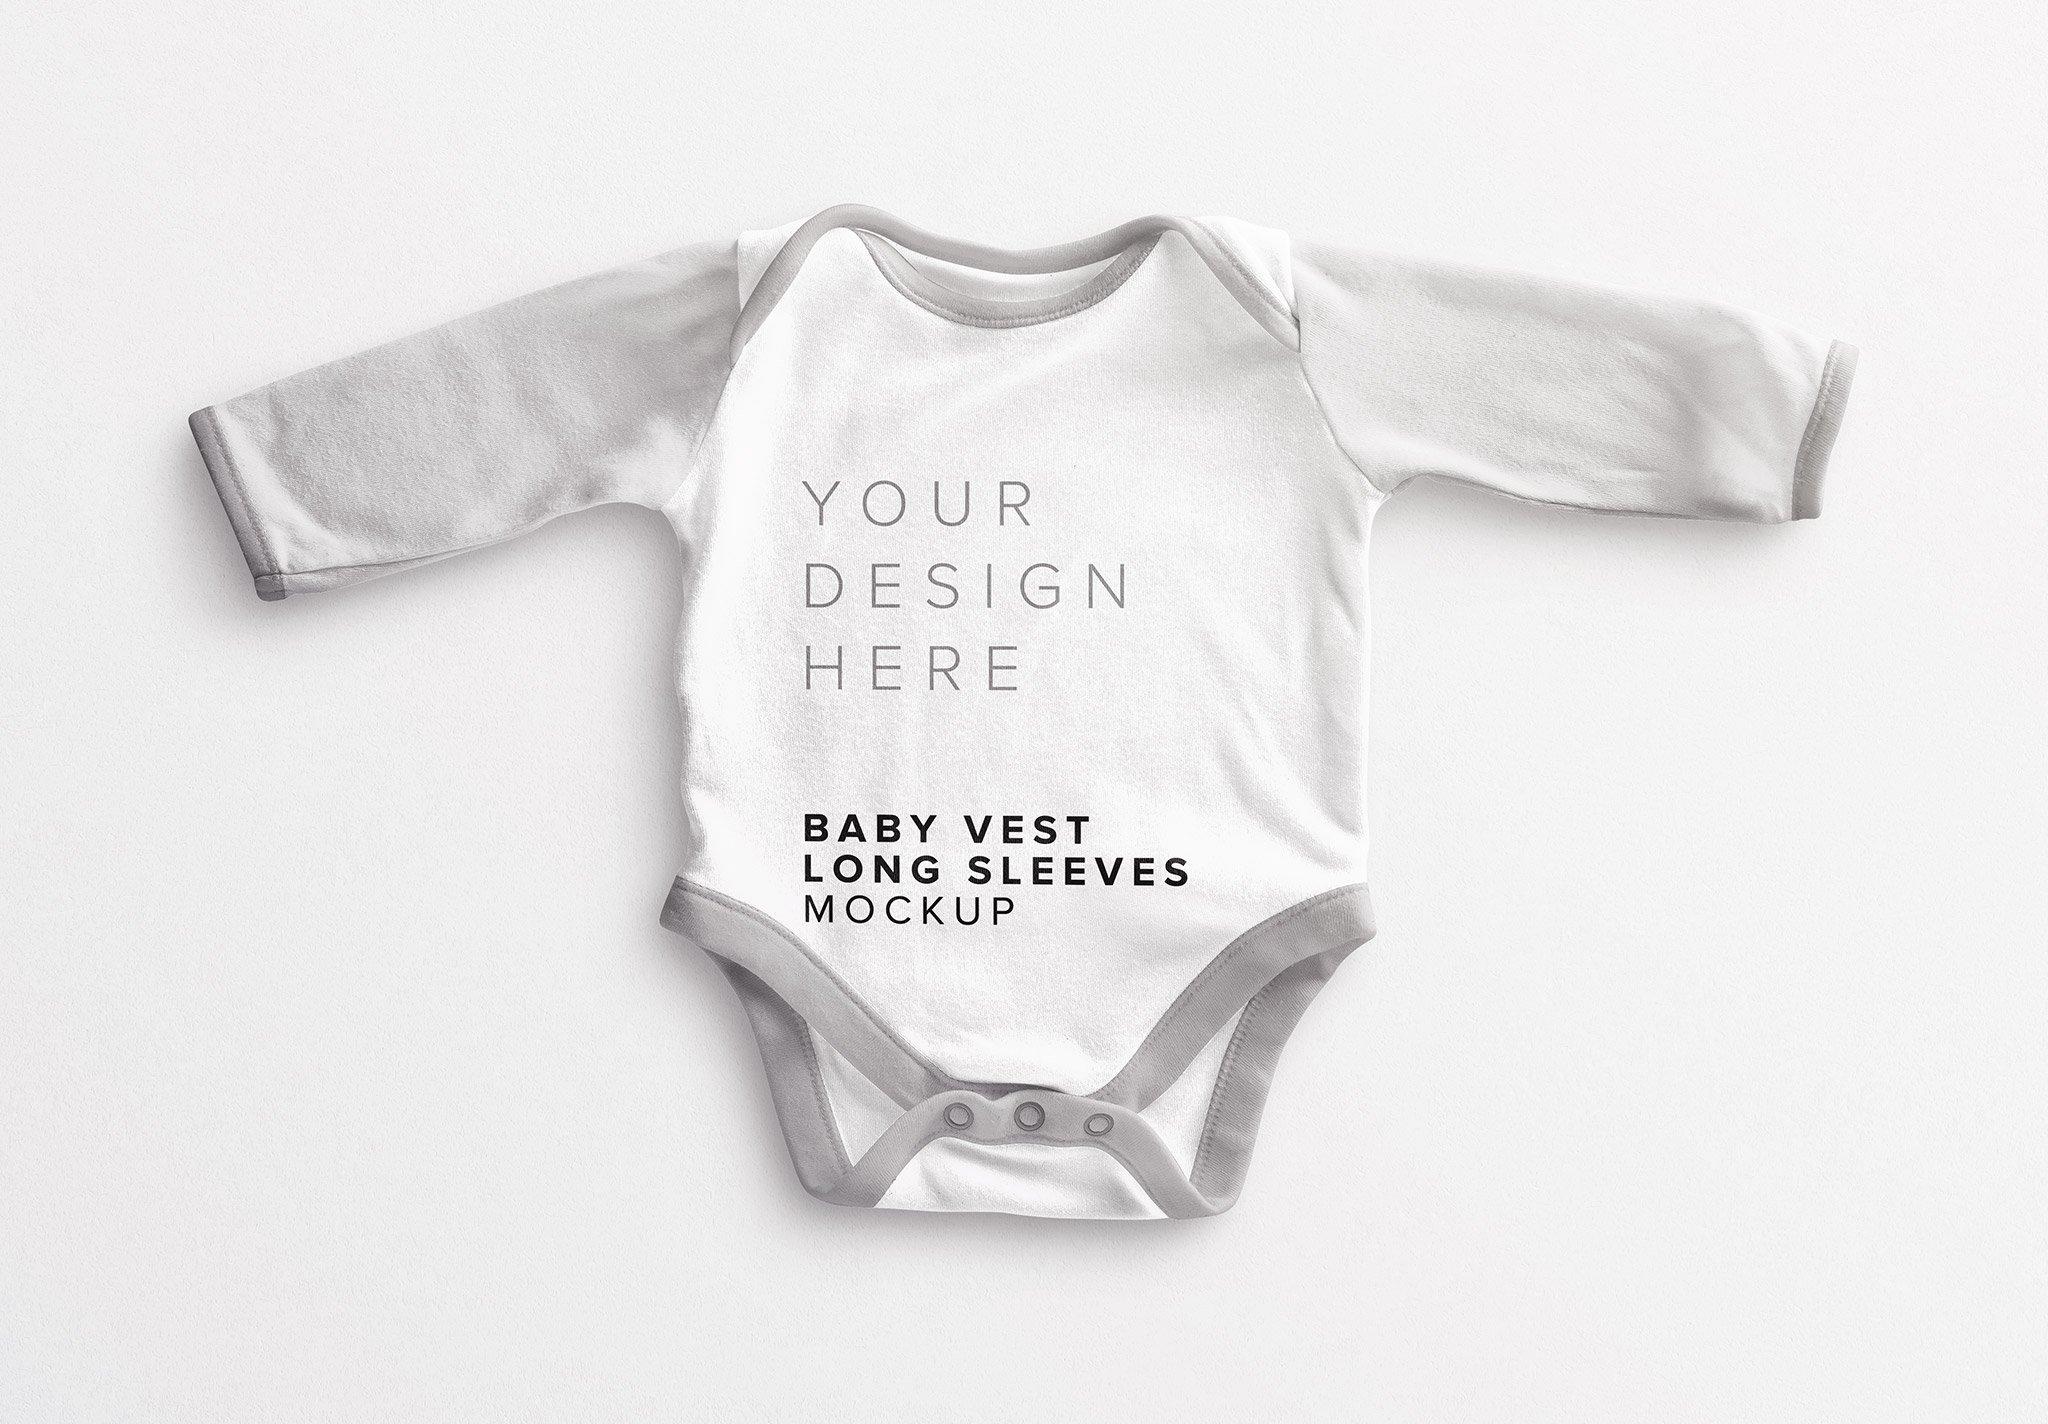 Baby Vest Long Sleeves Mockup Thumbnail